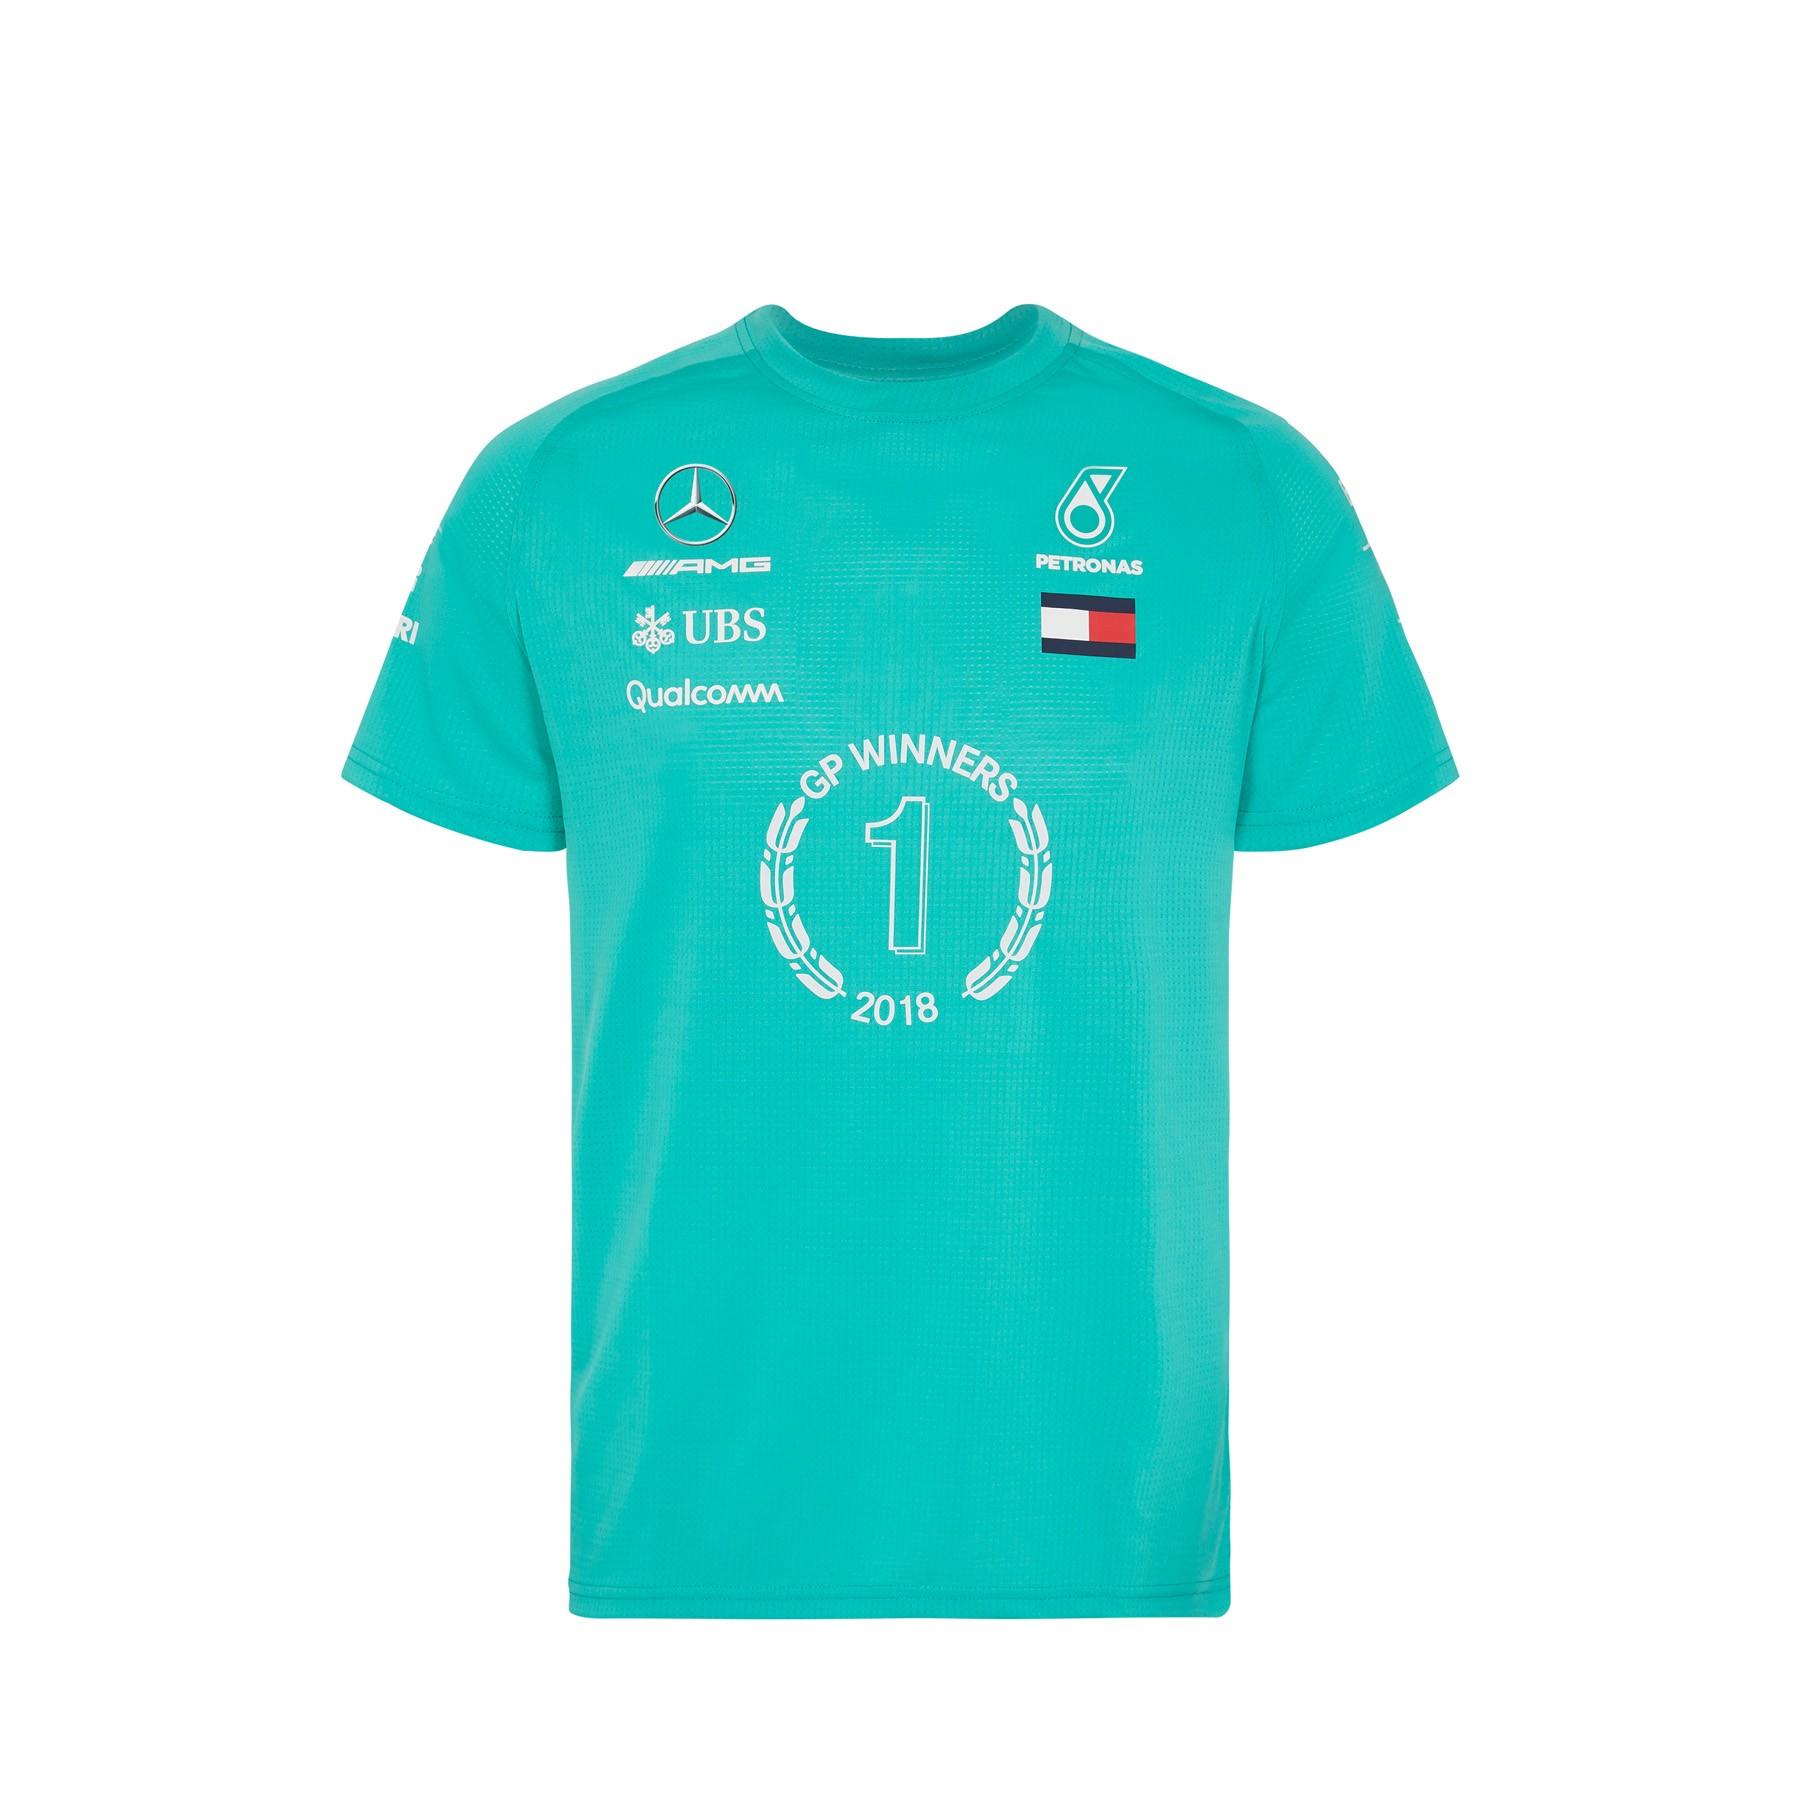 2018 Mercedes-AMG F1 Lewis Hamilton 2018 Race Winner T-Shirt by Tommy Hilfiger